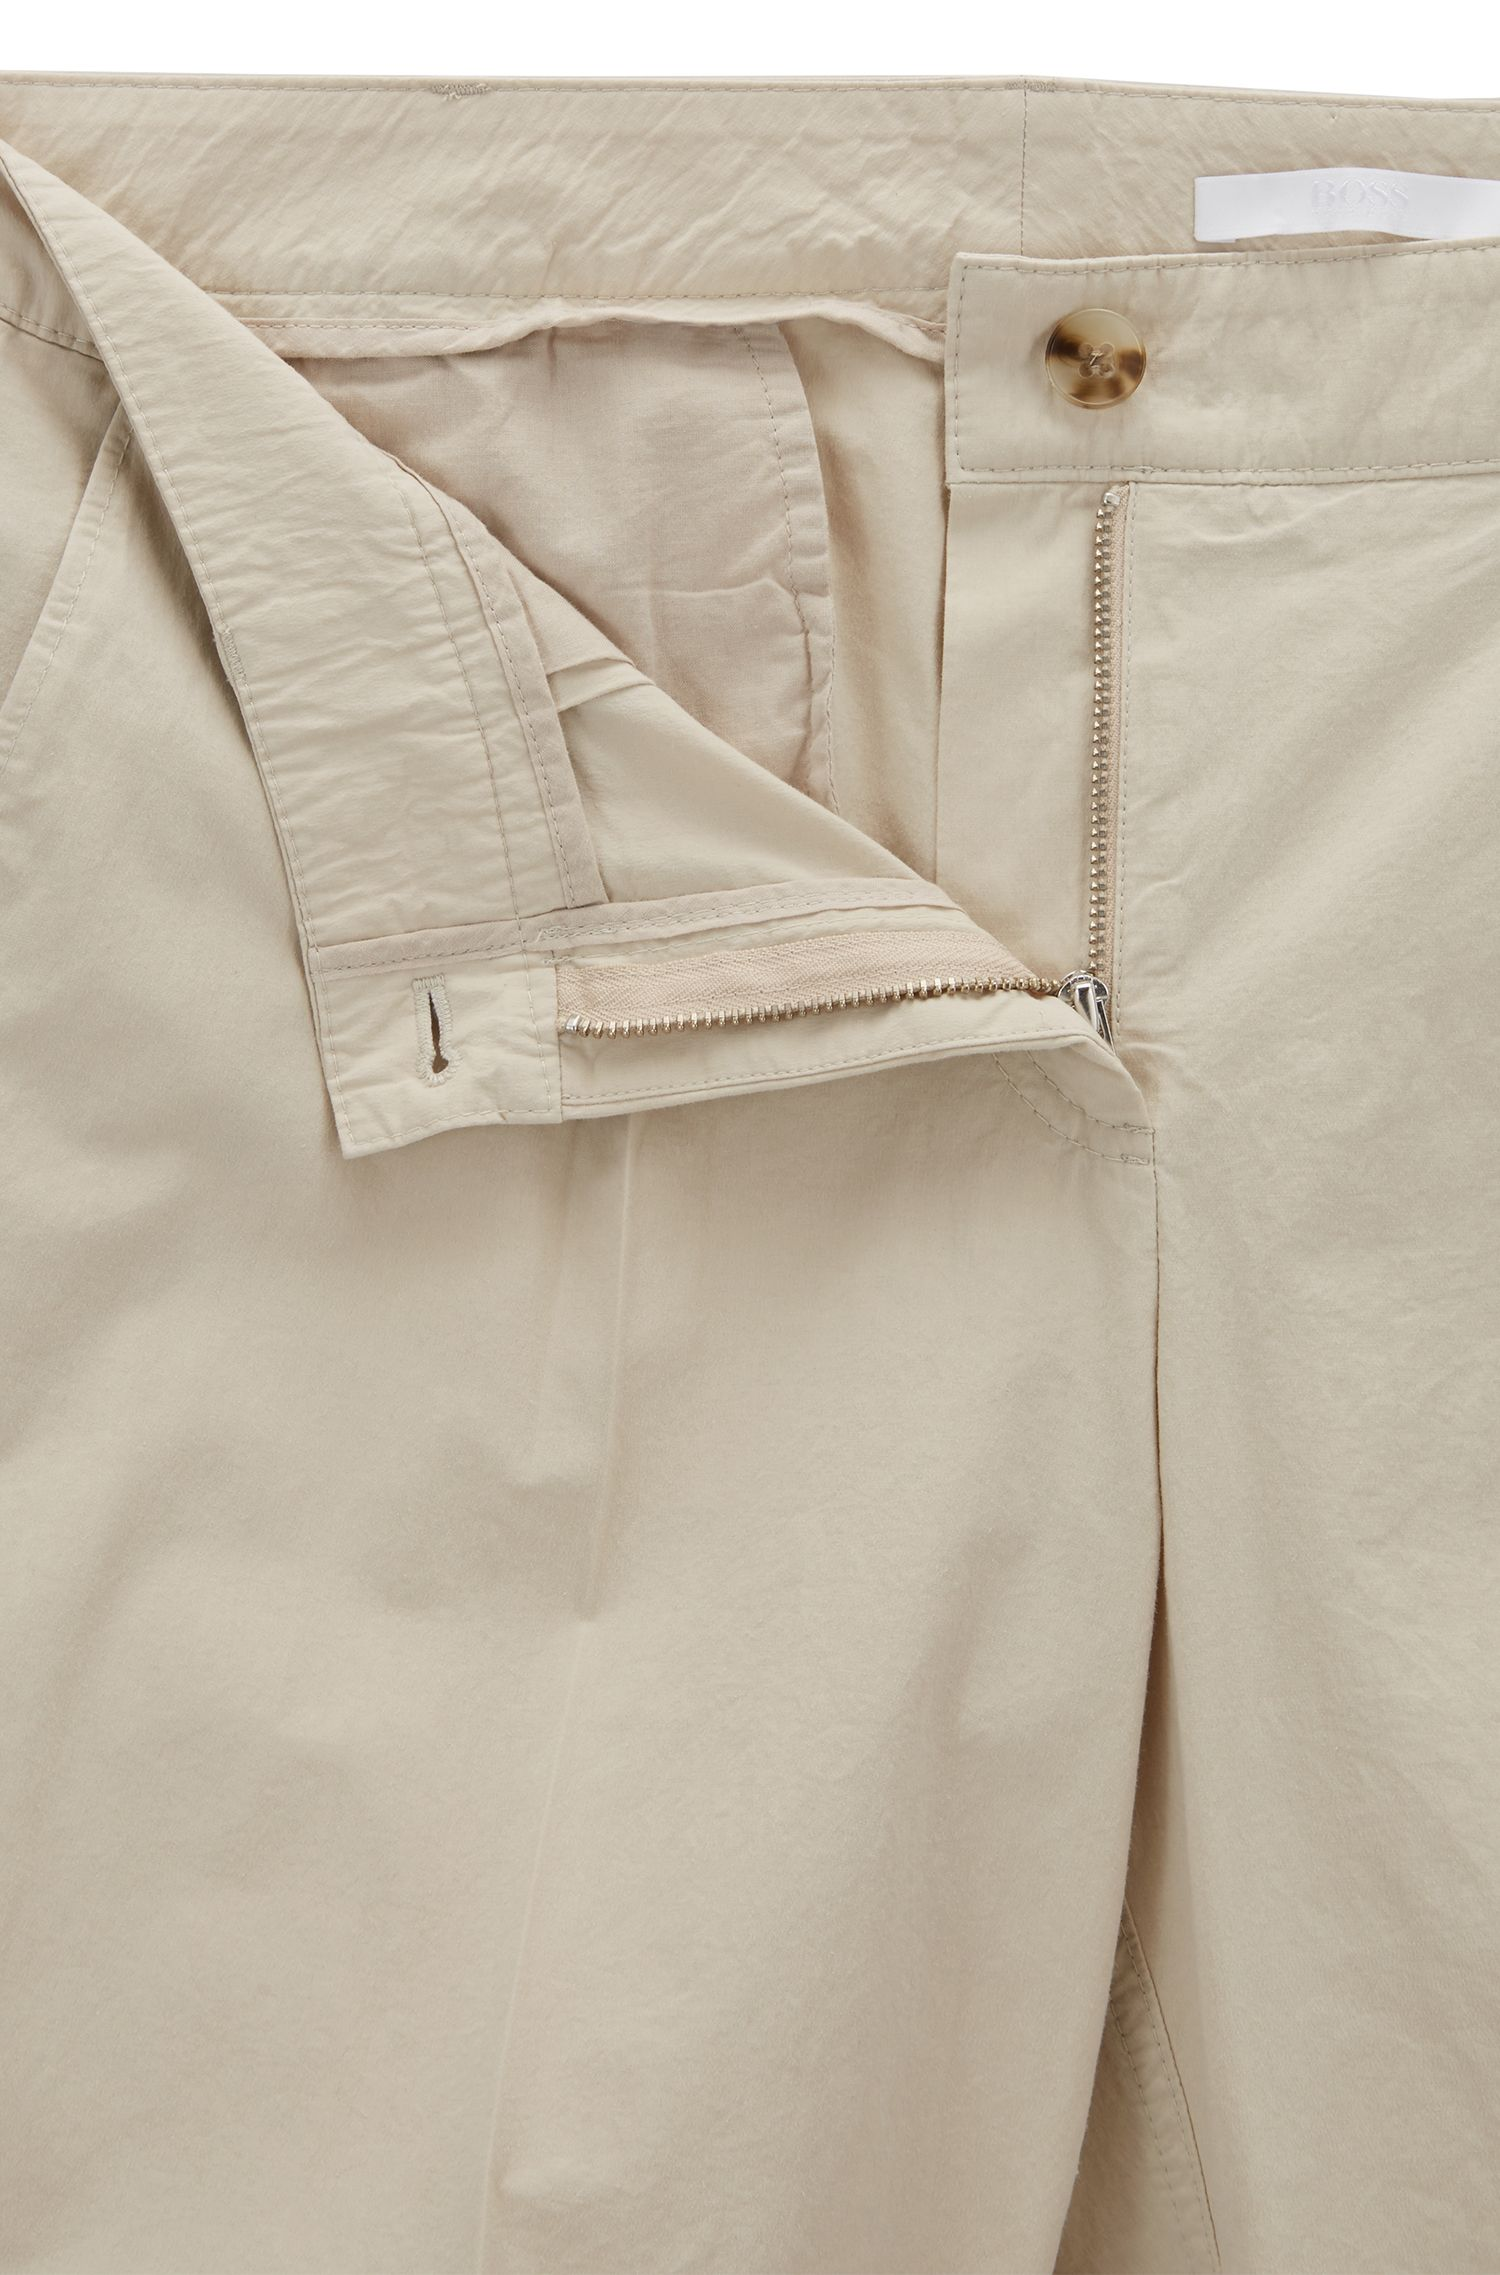 Pantalon raccourci en coton mélangé